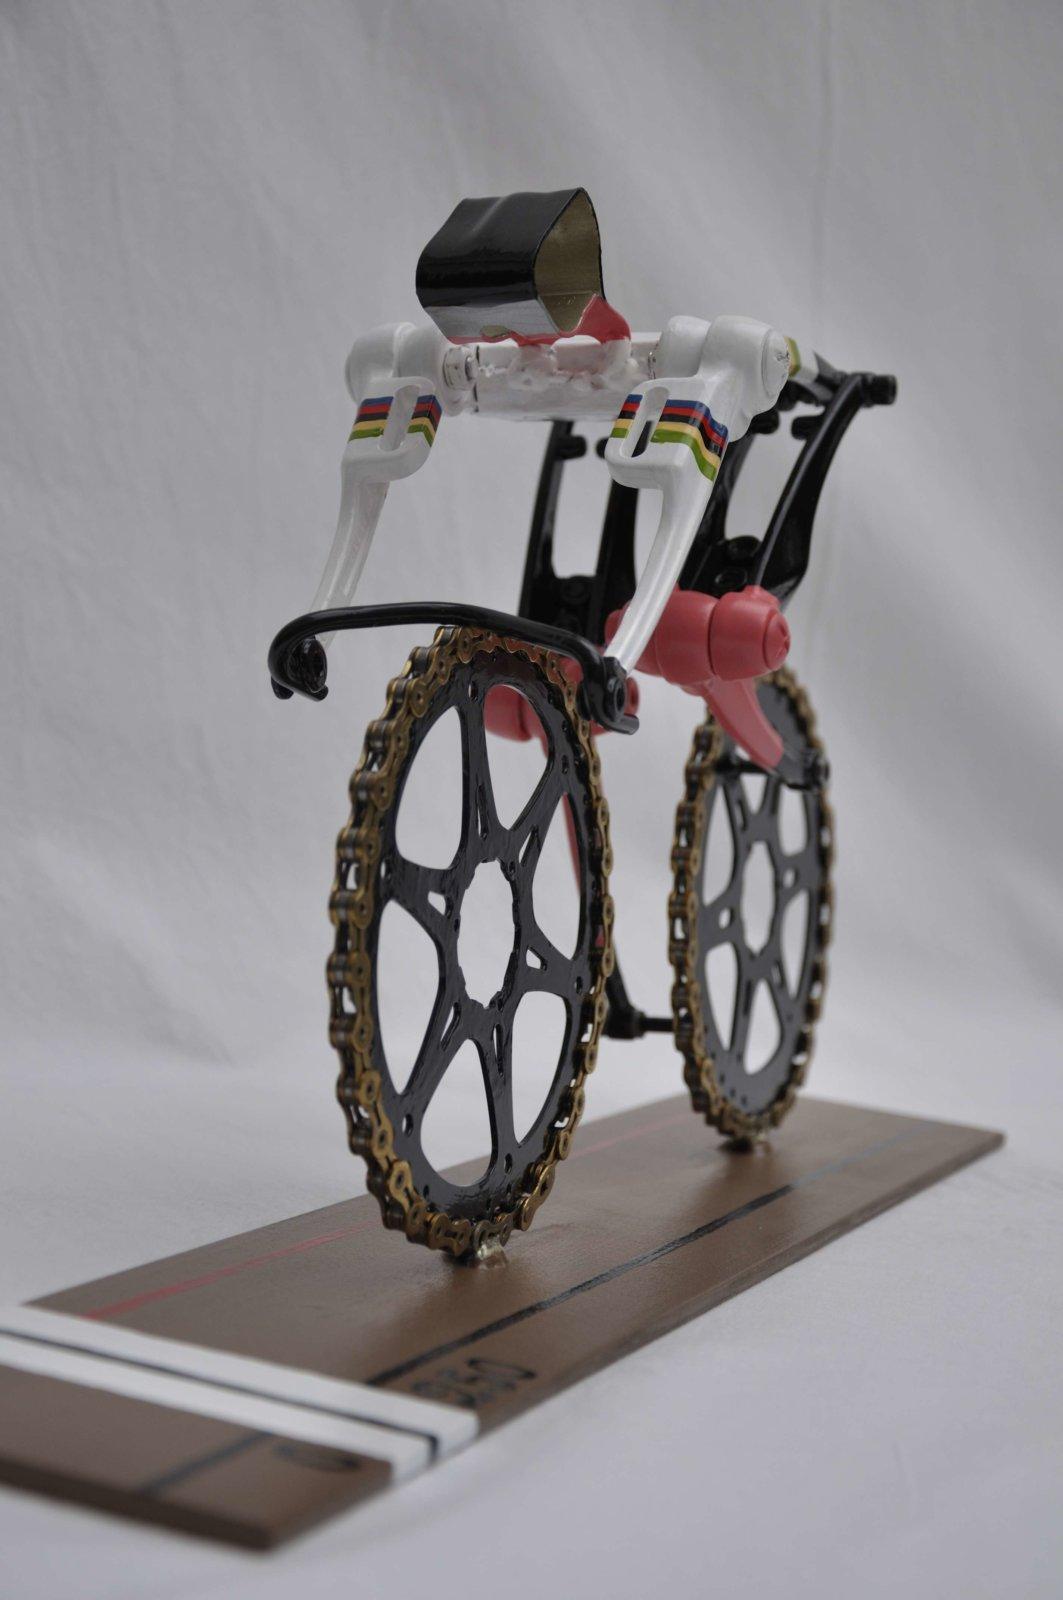 World Champion Trackcycling Cyclingart By Decreatievelink